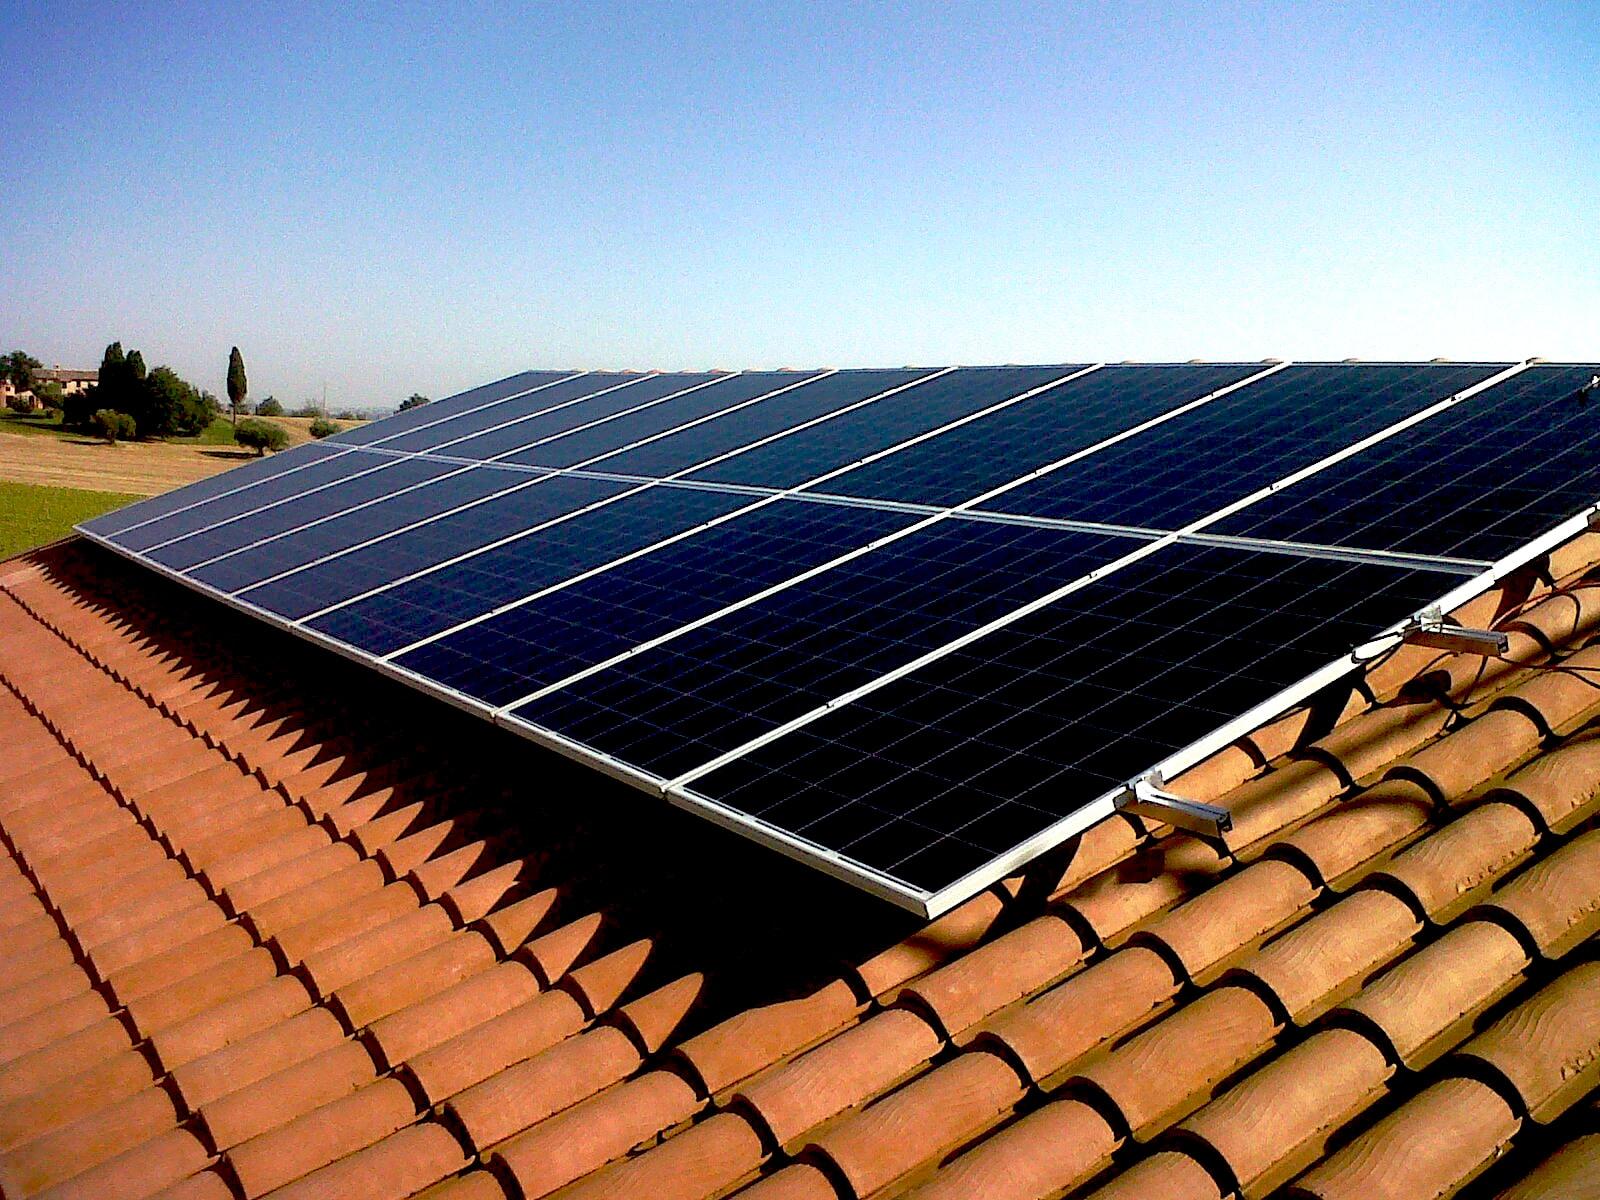 Daniele-Iudicone-Fotovoltaico-Semplice